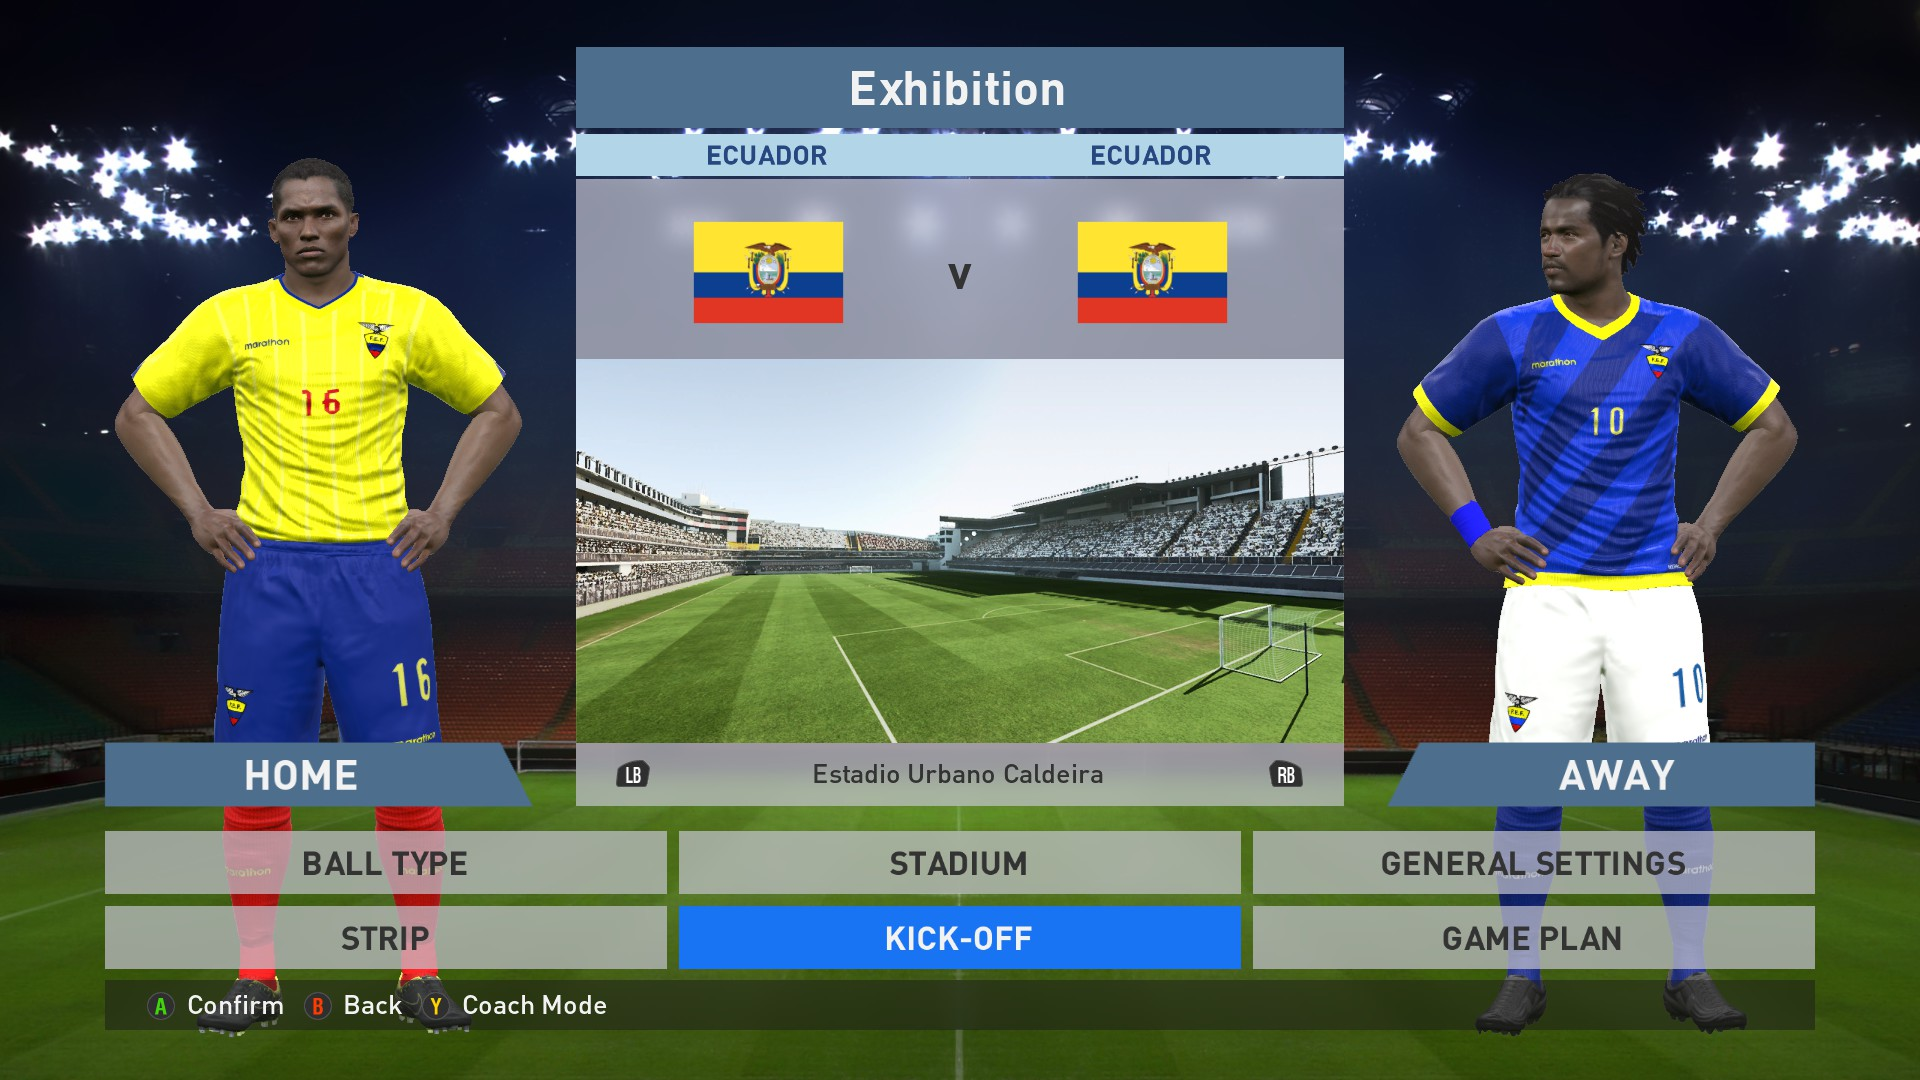 be824db89d6 Add media Report RSS Ecuador national team Home Away kits (view original)